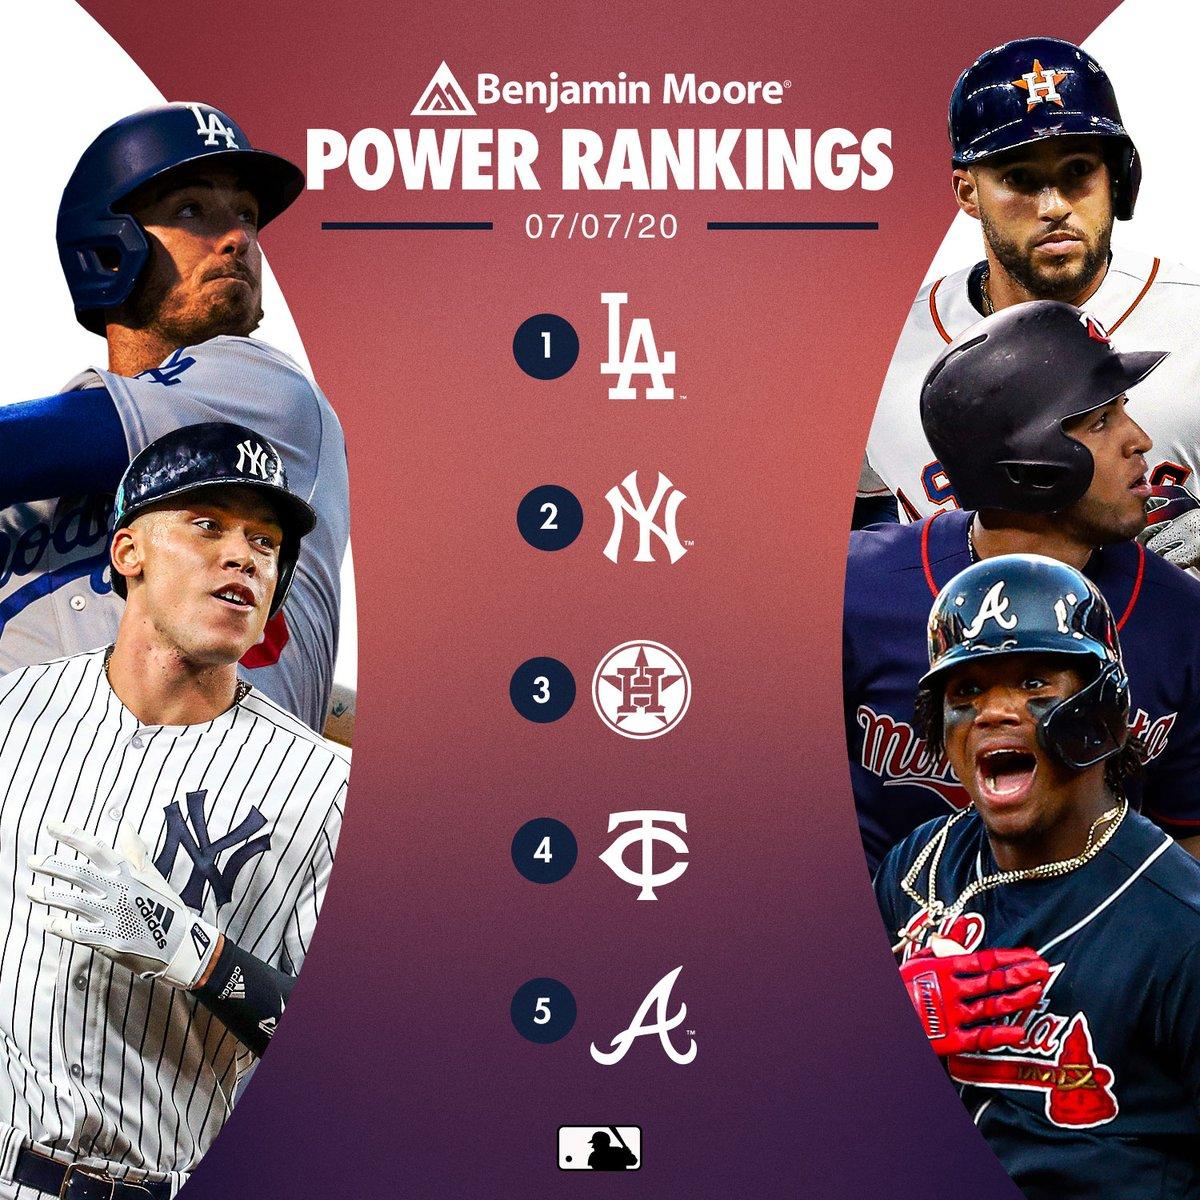 Power rankings are here. How'd we do? atmlb.com/2BQz3M5 (MLB x @Benjamin_Moore)